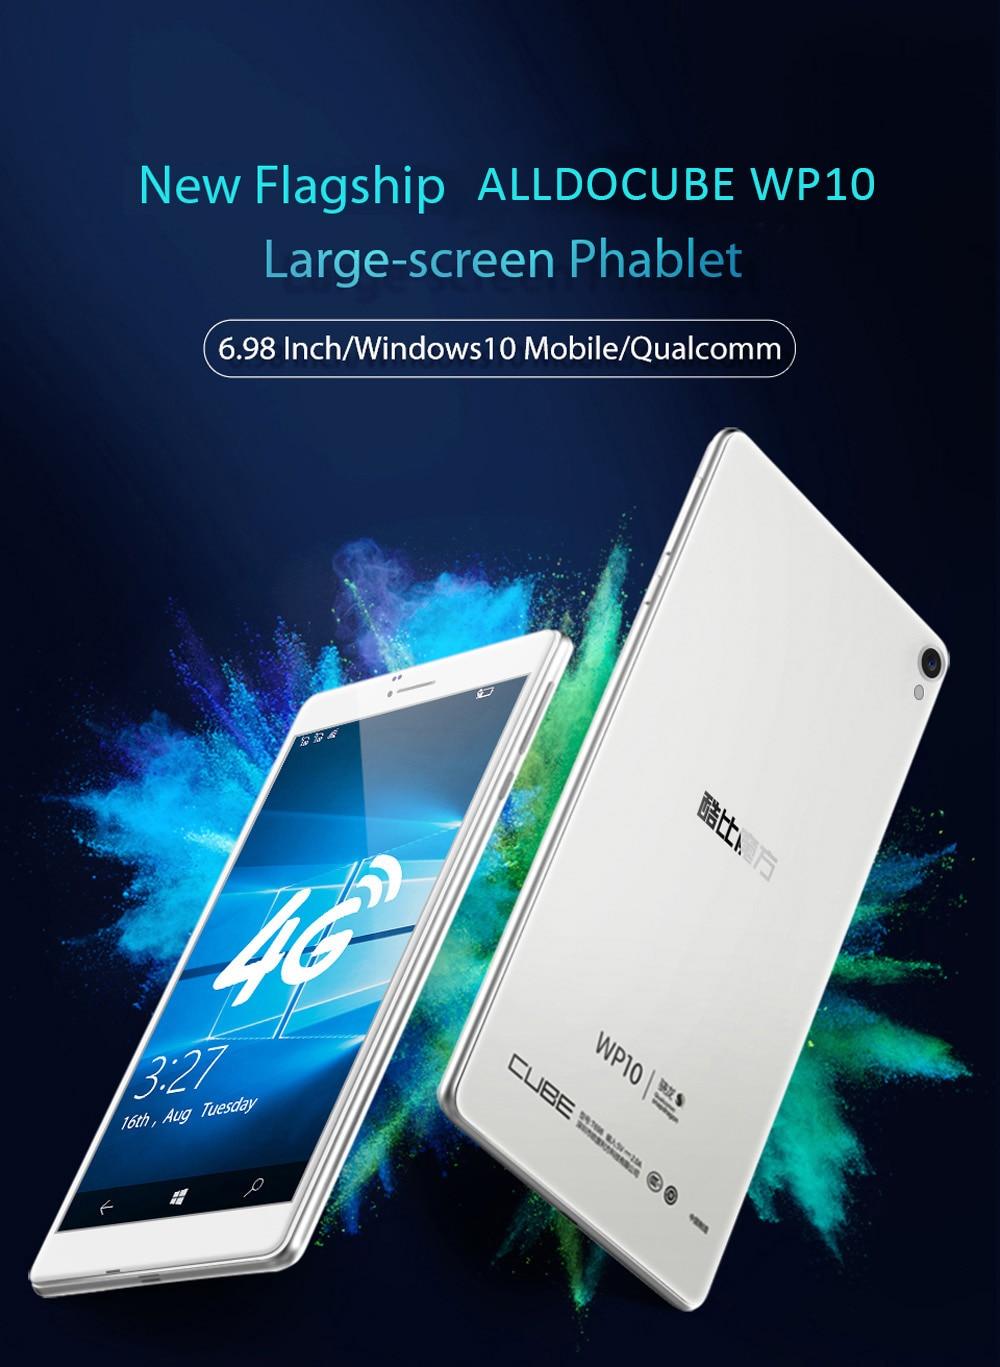 ALLDOCUBE WP10 6 98 Inch 4G LTE Phone Call Tablet Windows 10 Mobile Quad  Core 1 3GHz 2GB RAM 16GB Camera IPS Screen WiFi OTG GPS